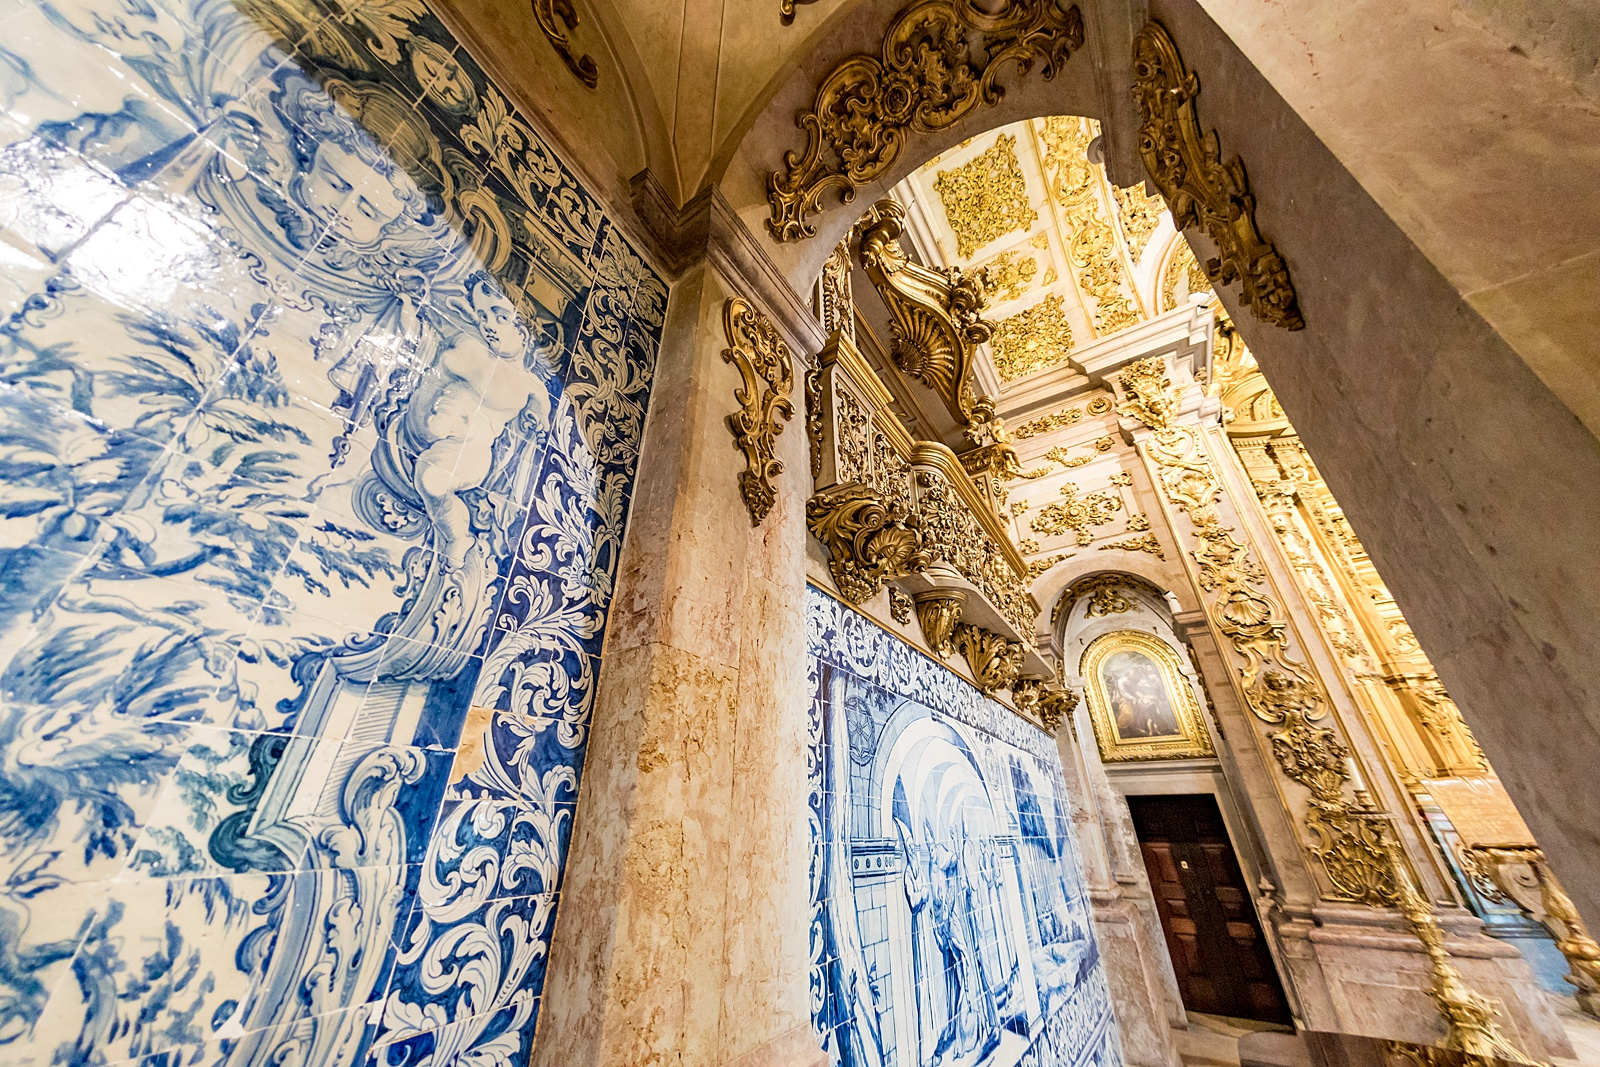 National Tile Museum Azulejo, Lisbon